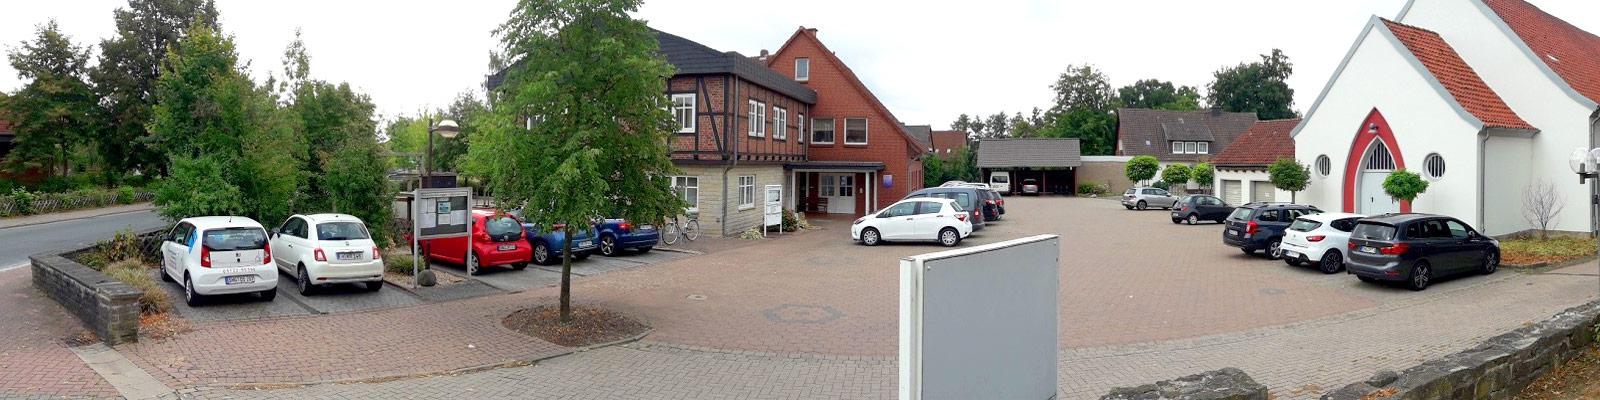 Diakonie Pflegedient Schaumburg Meerbeck